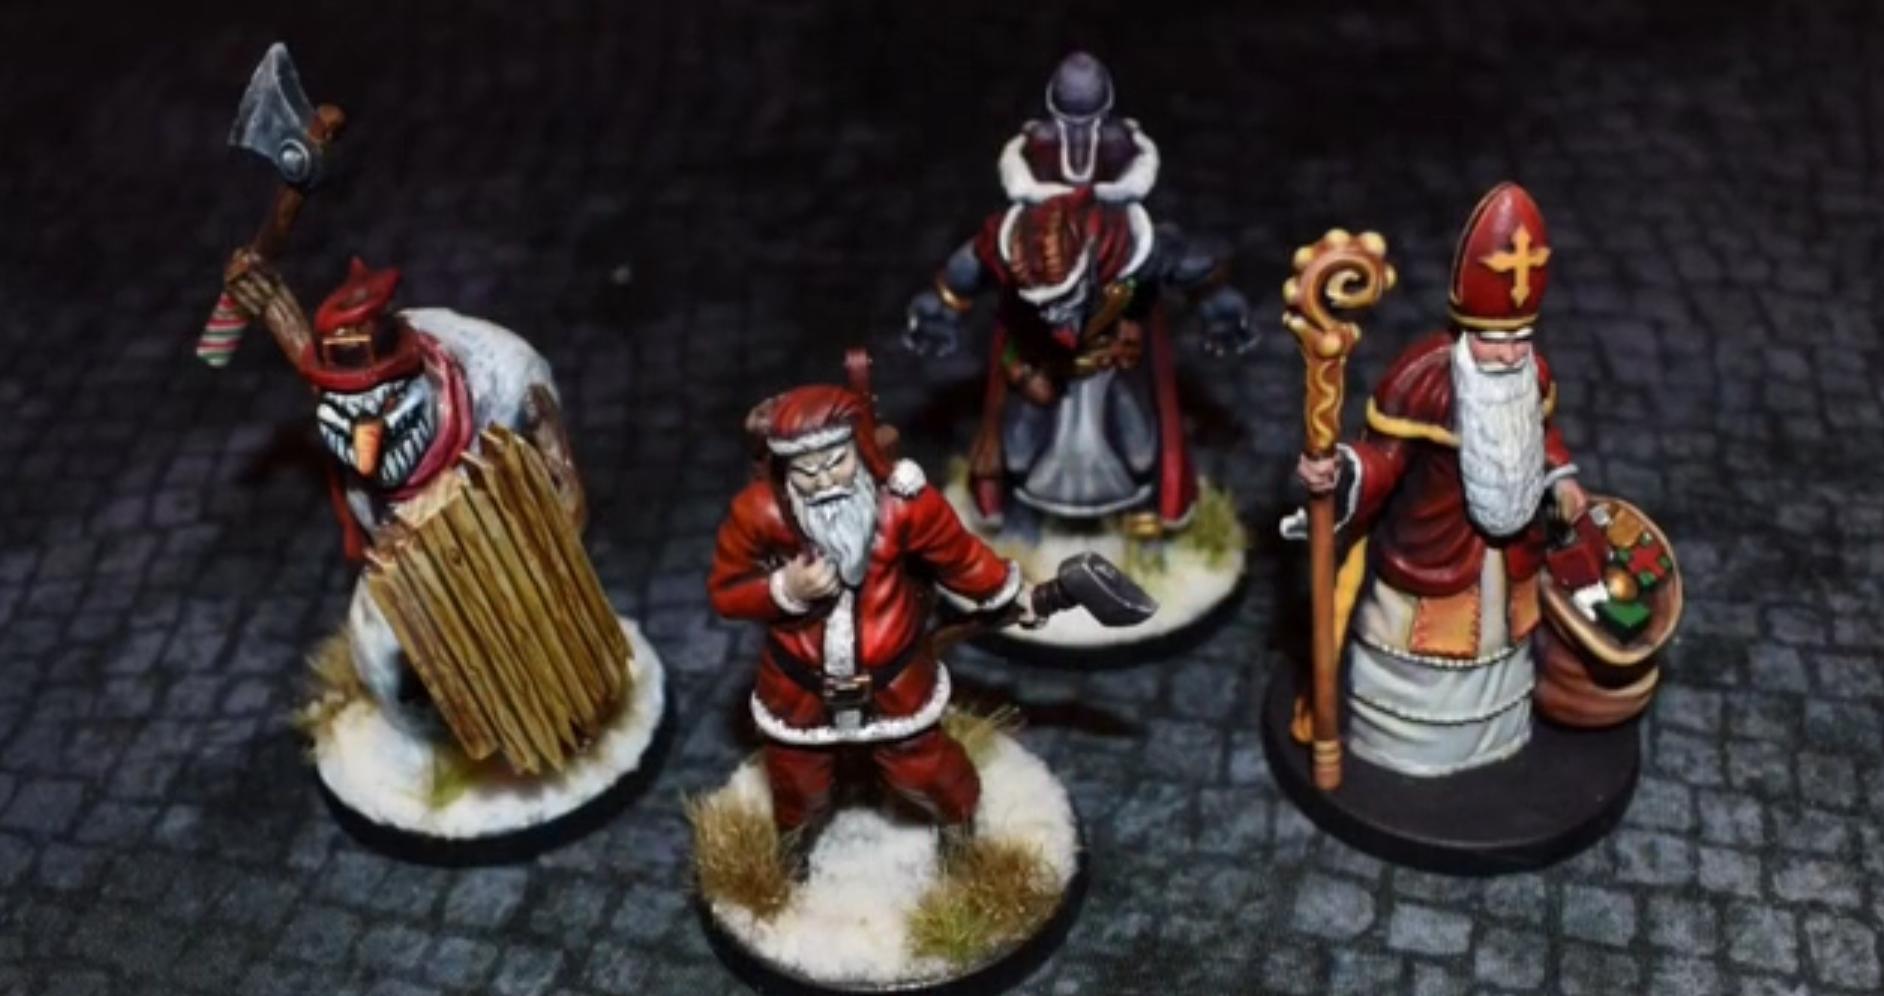 Unpainted Christmas Village